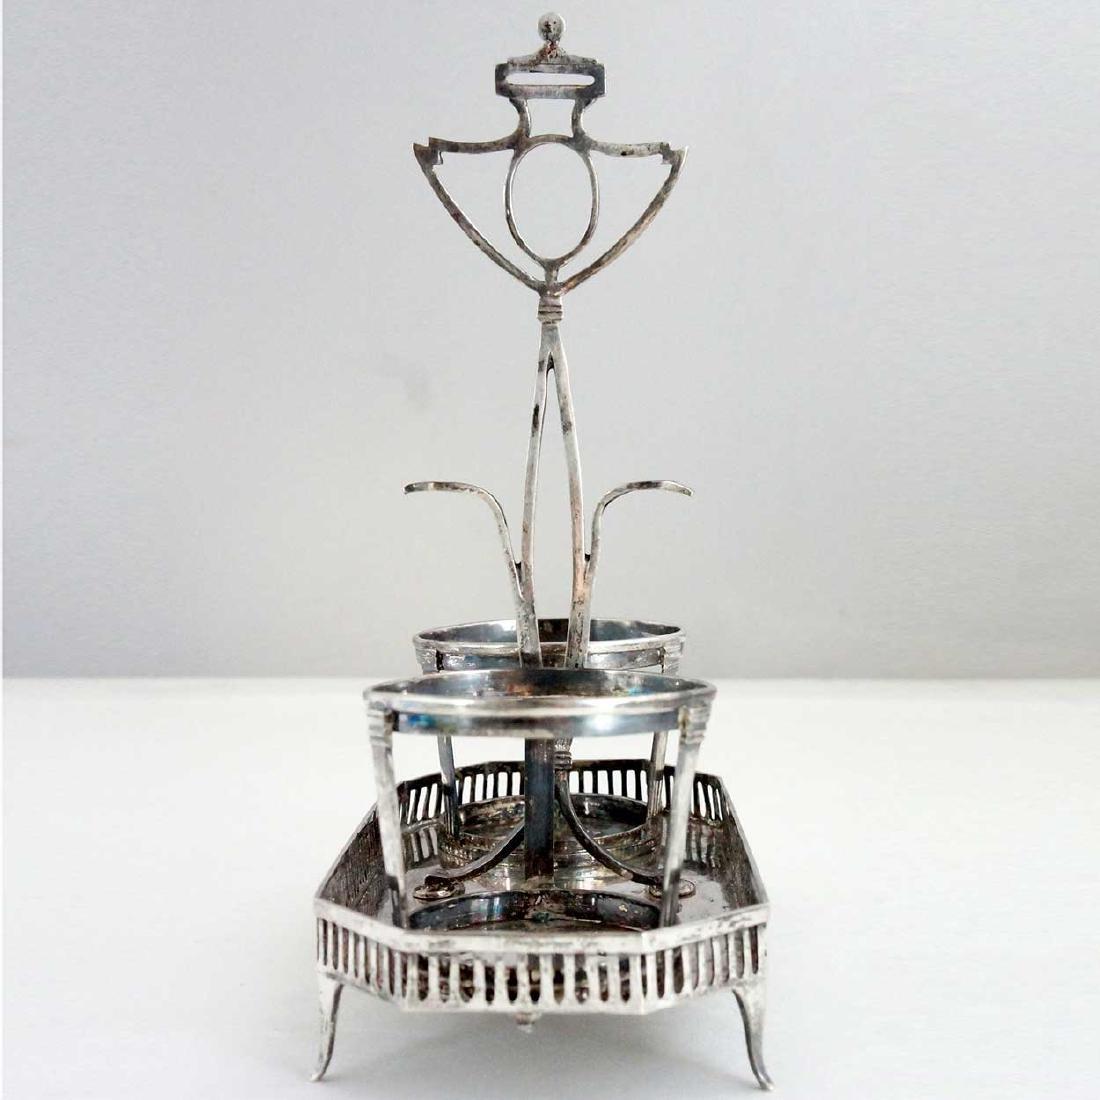 23 Antique Silver & Coin Silver Flatware & Cruet Stand - 3